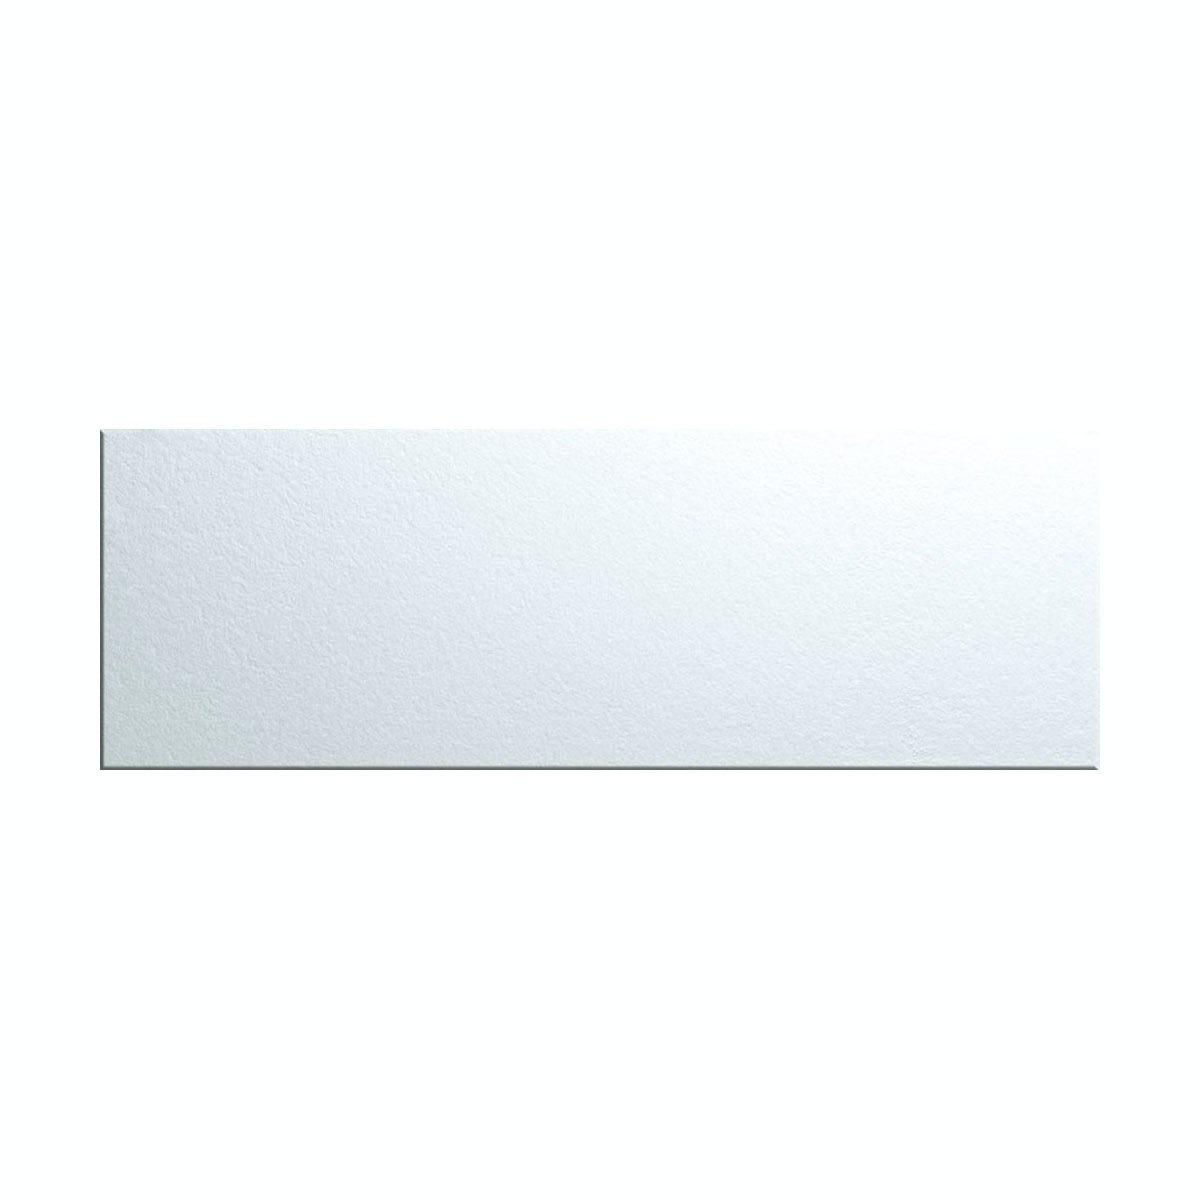 British Ceramic Tile glass silver tile 148mm x 448mm - Box of 5